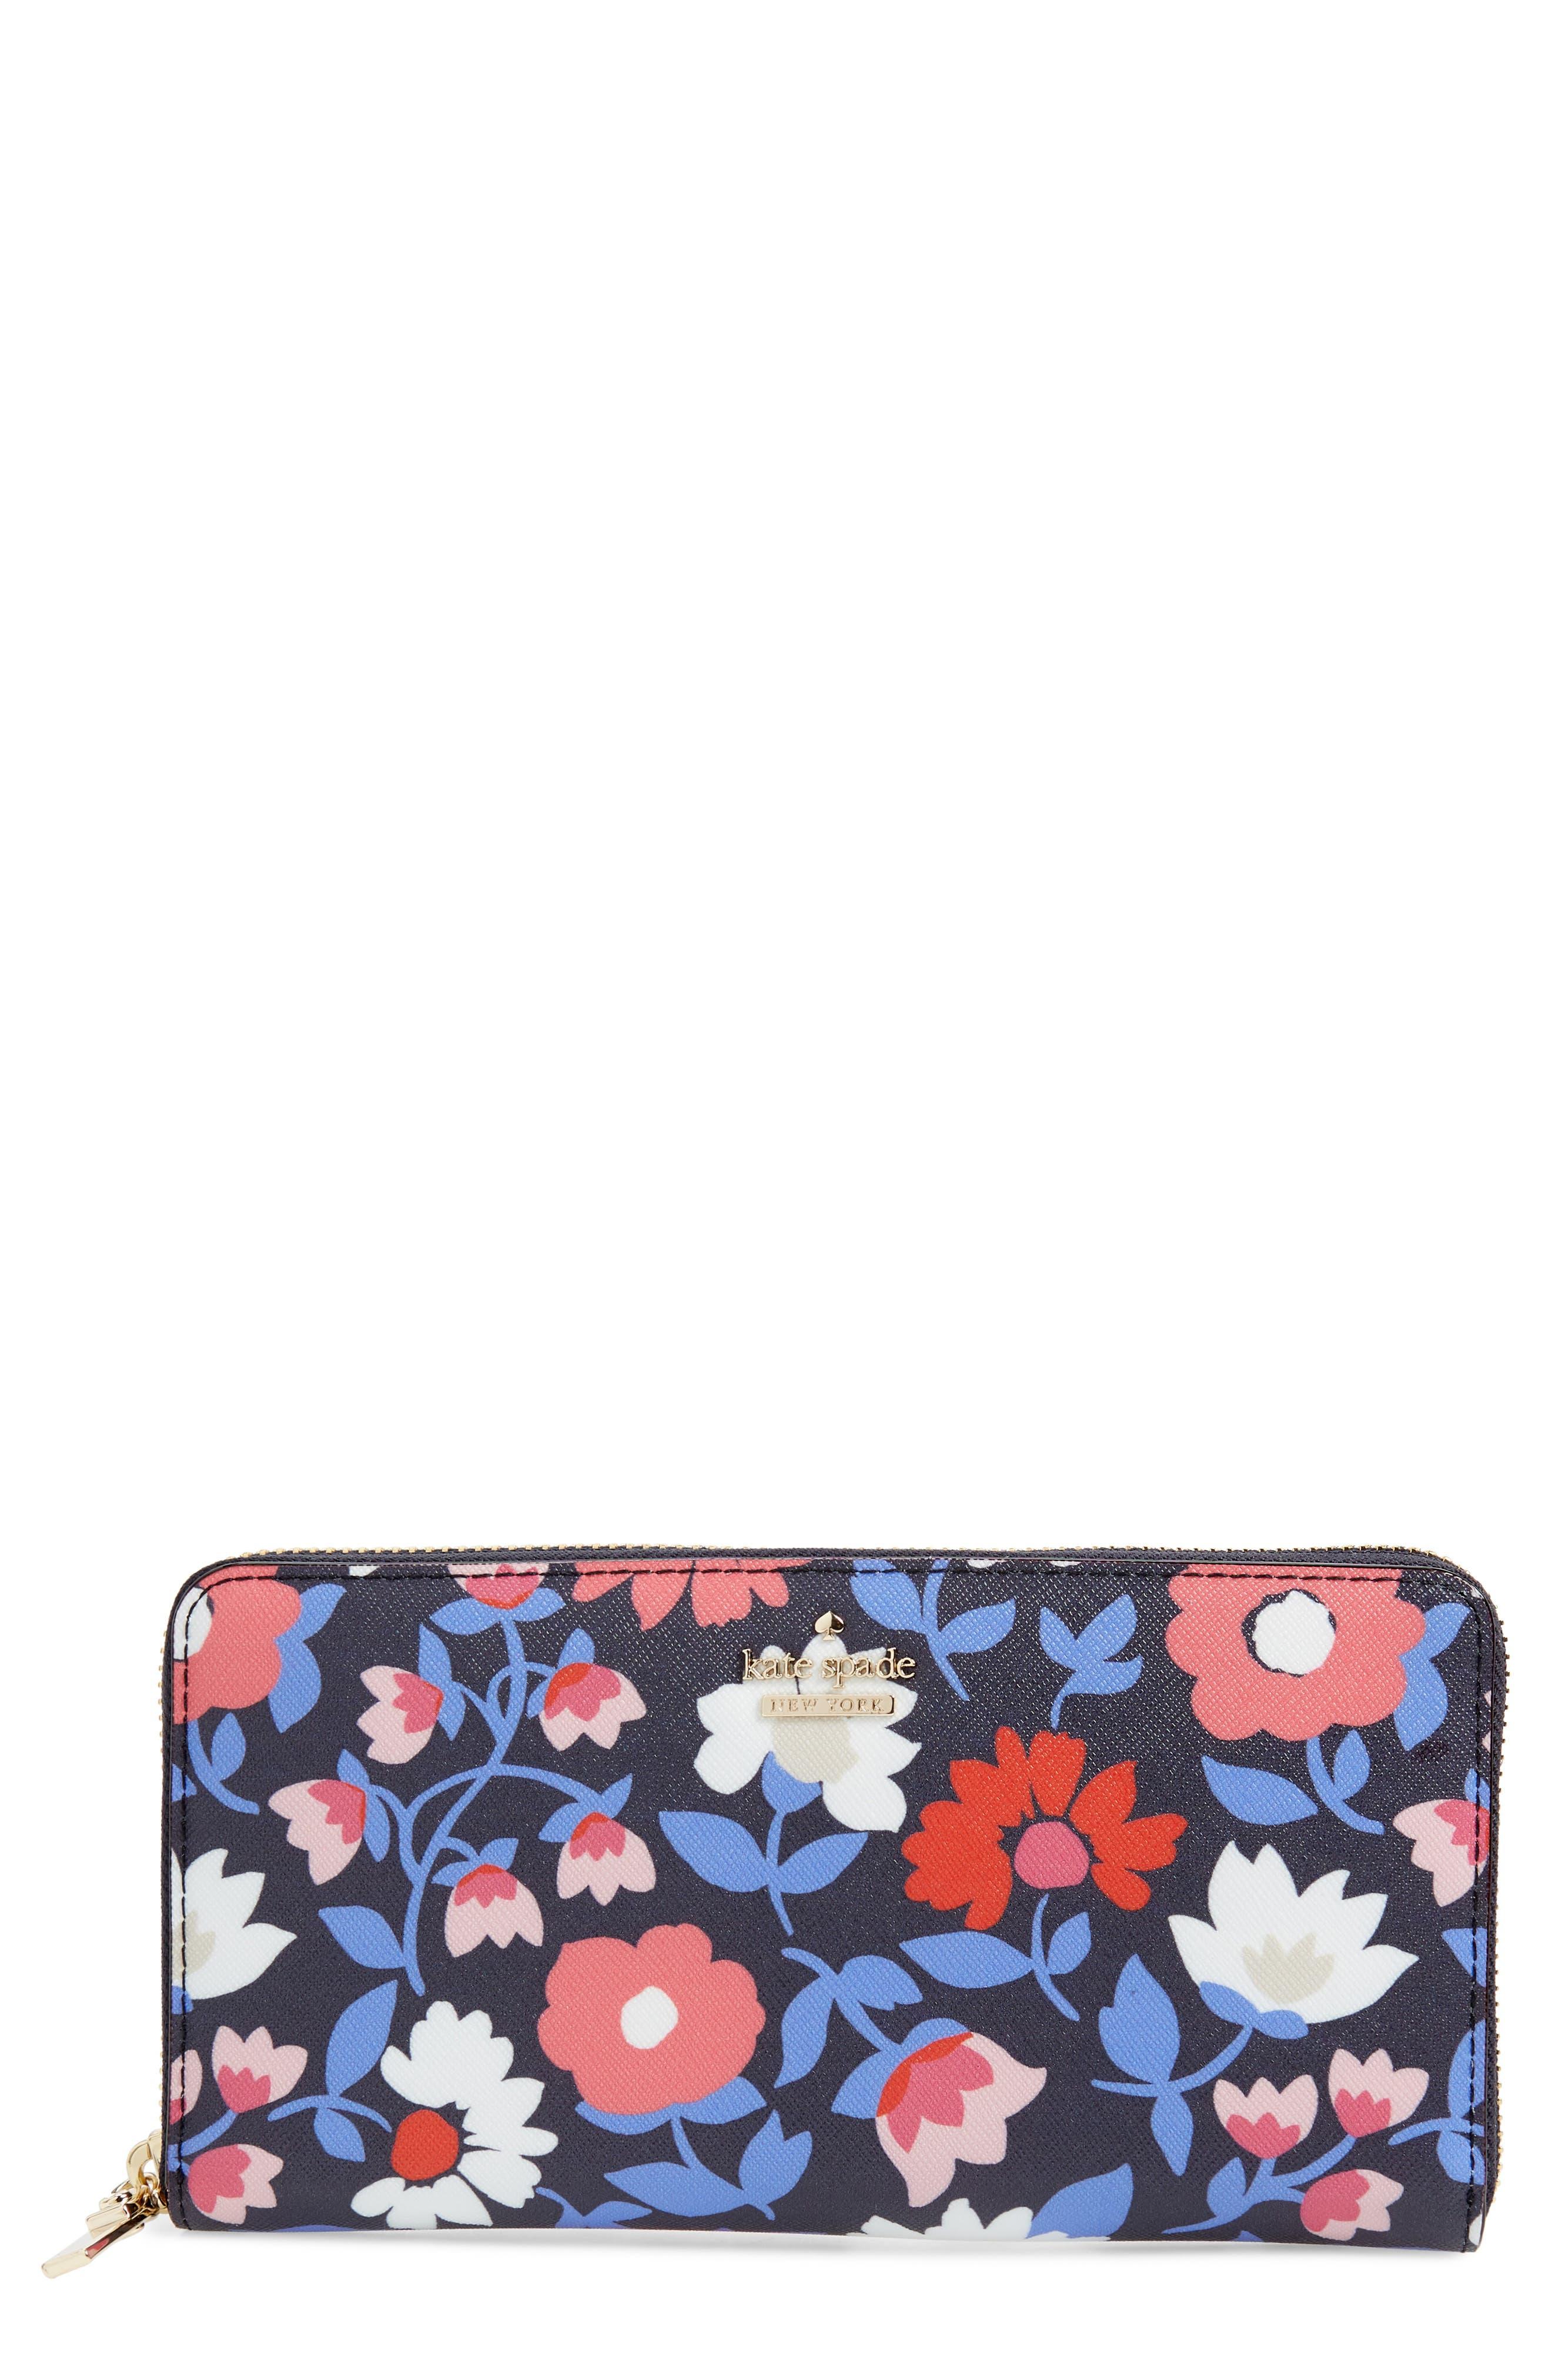 cameron street - daisy lacey zip around wallet,                             Main thumbnail 1, color,                             650